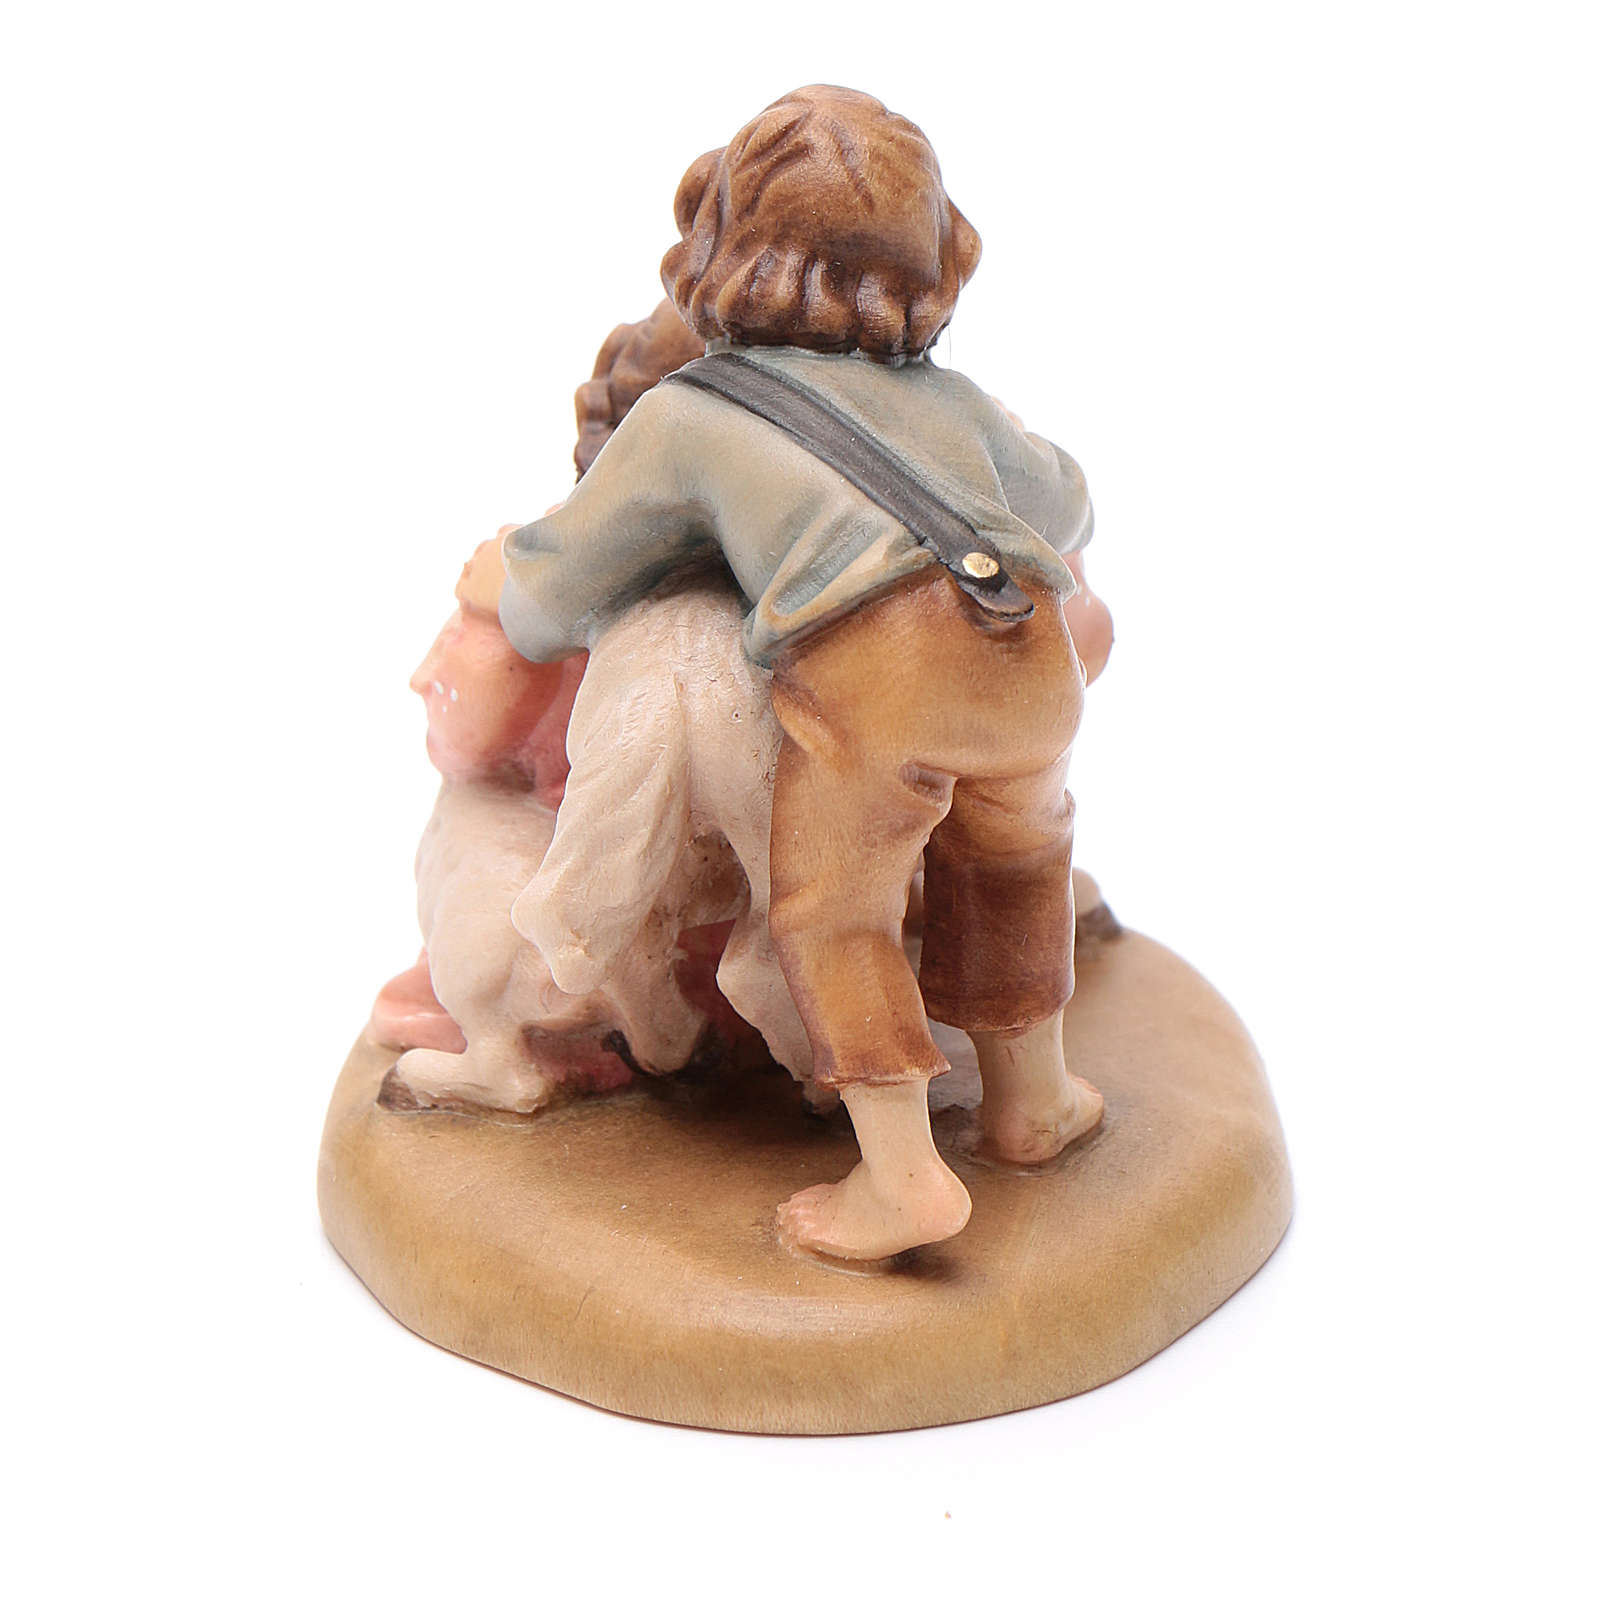 Young shepherds figurine, Val Gardena Model 12cm 4